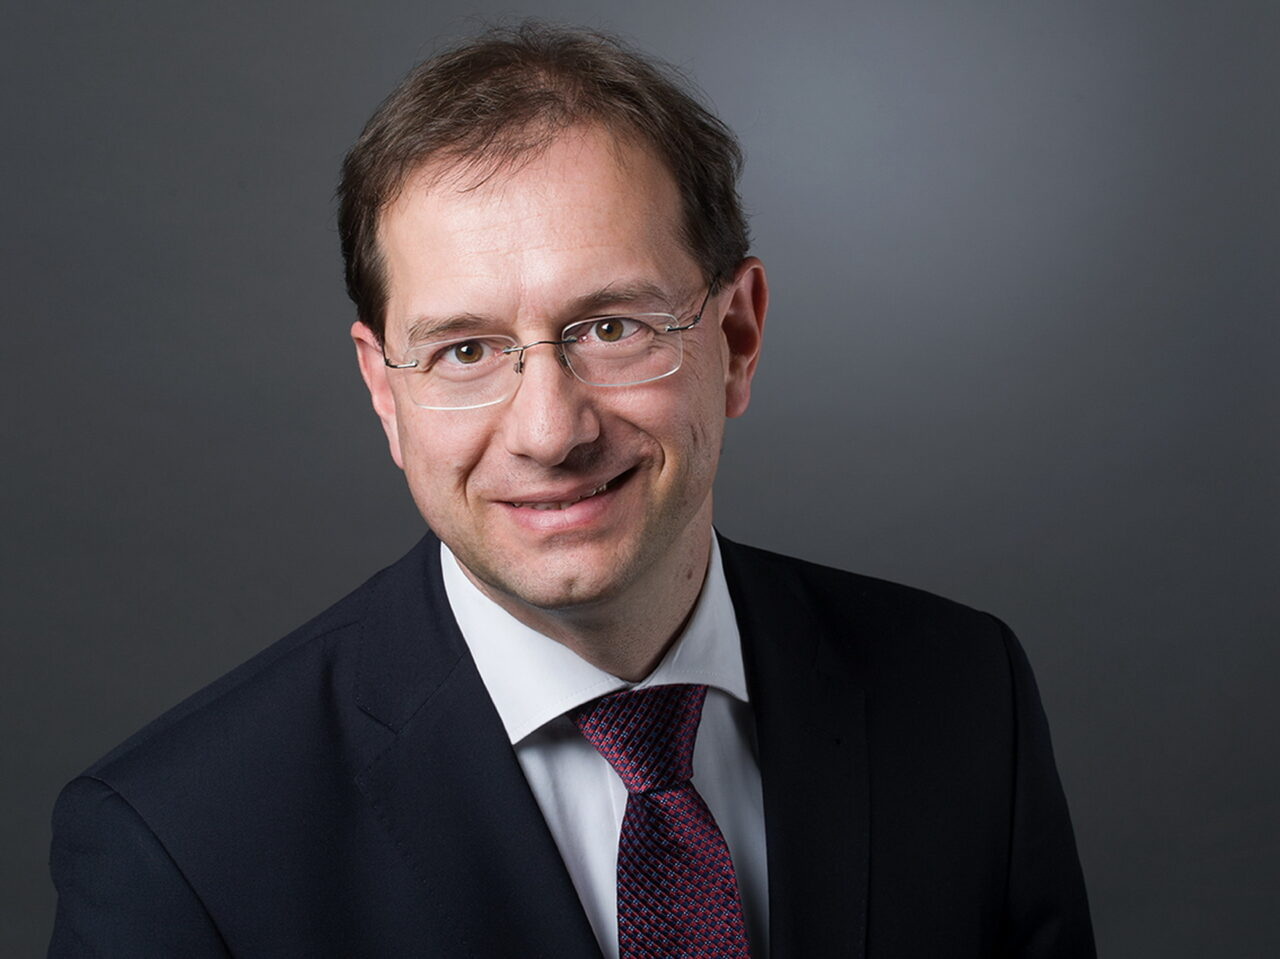 https://intelligent-investors.de/wp-content/uploads/2021/04/Juergen-Huth_2-1280x959.jpg